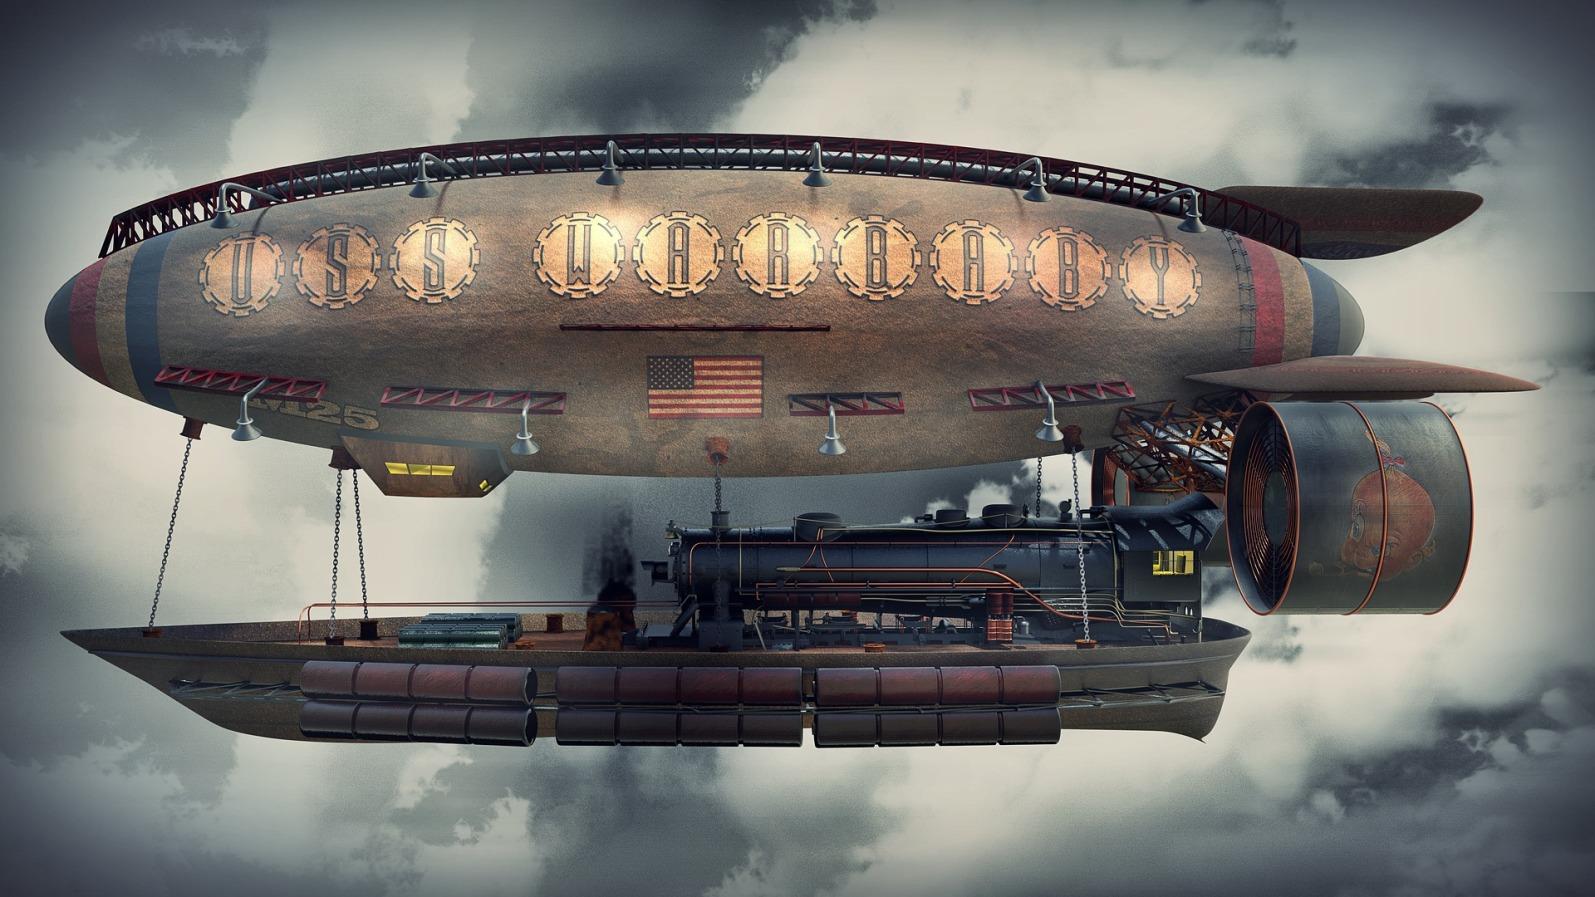 Airship - Original image